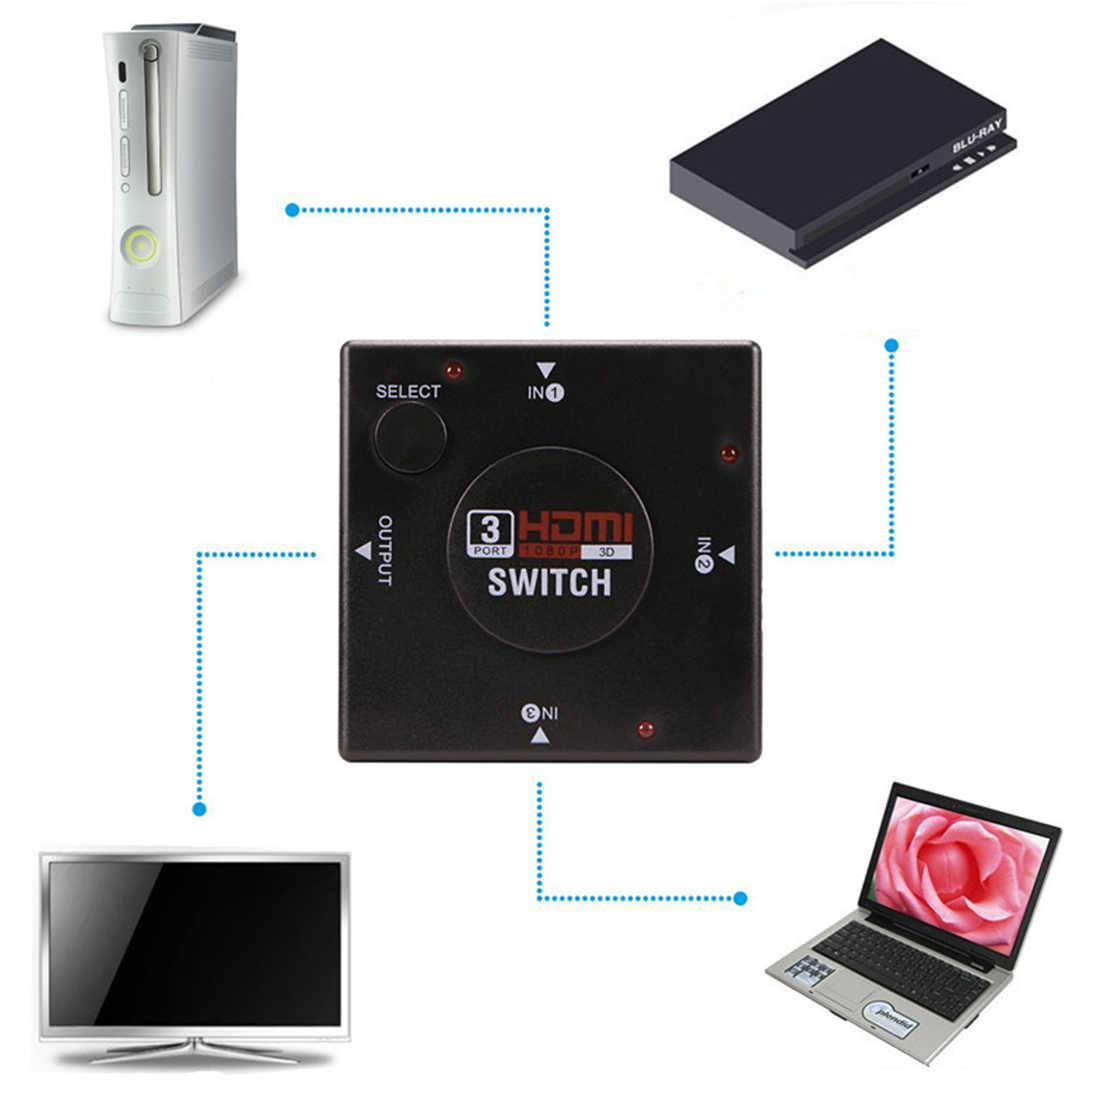 Centechia Mini 3 Port HDMI Switch Switcher Splitter 3 Input 1 Output Box HDMI Selector untuk PS3 PS4 Smart HDTV 1080P